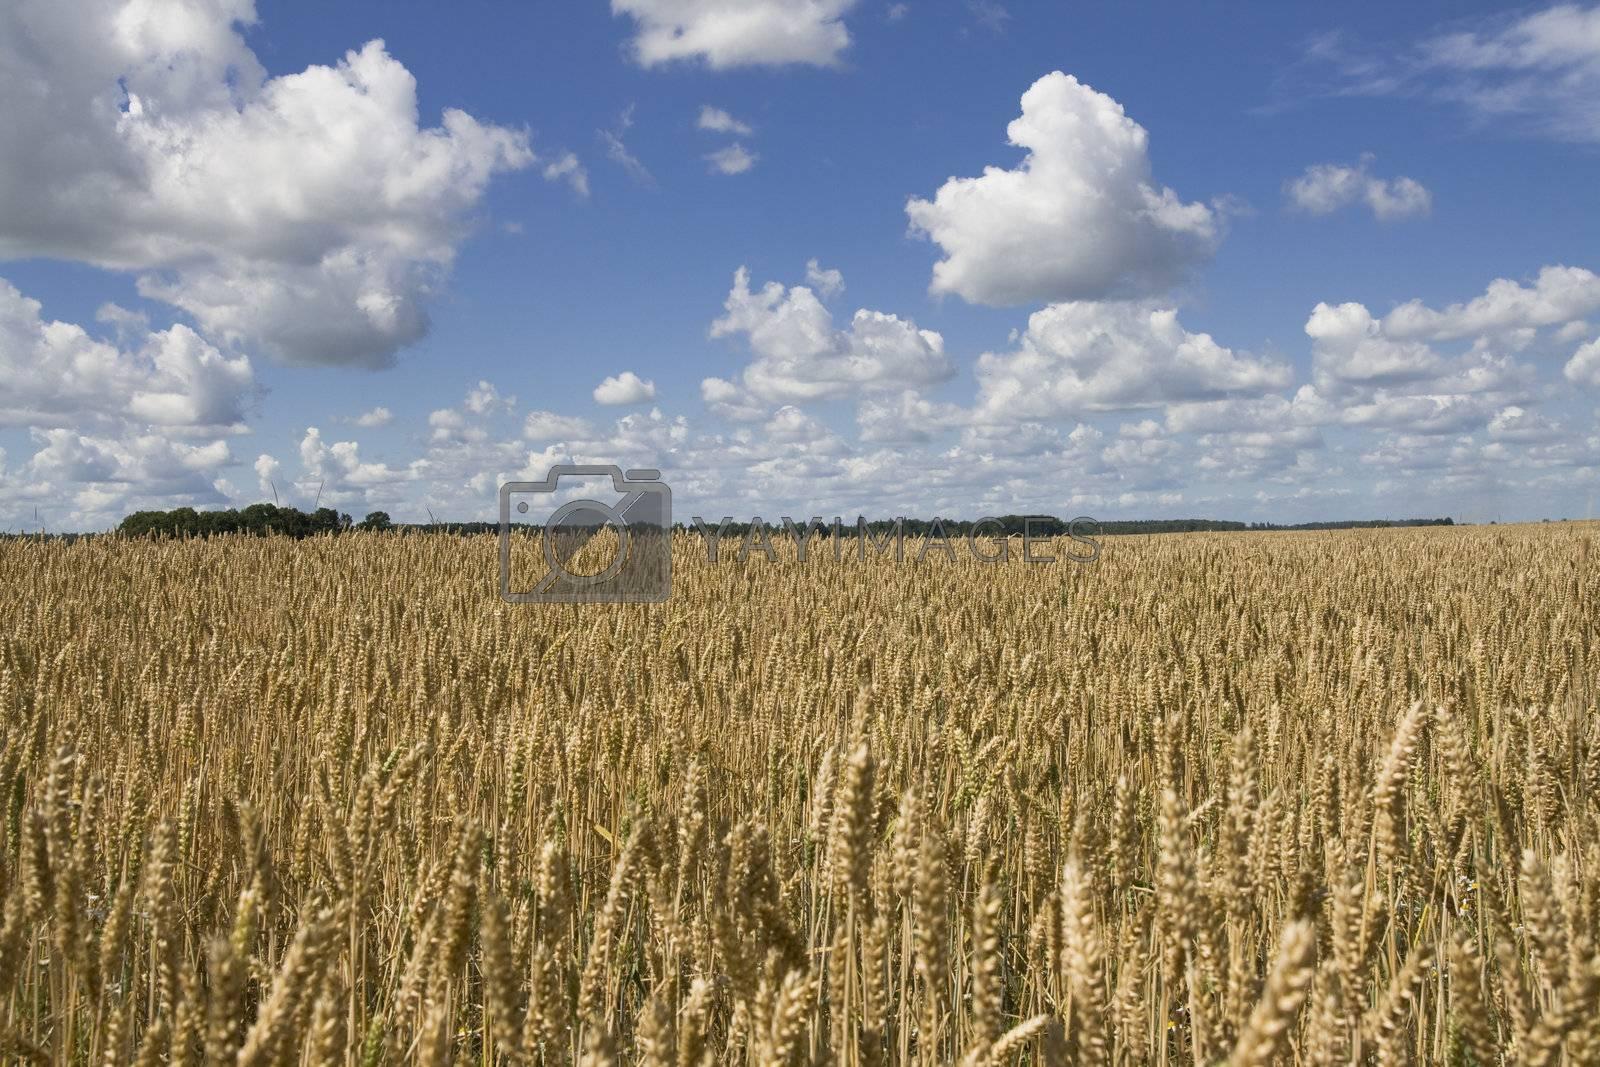 Field of wheat under blue cloudy sky